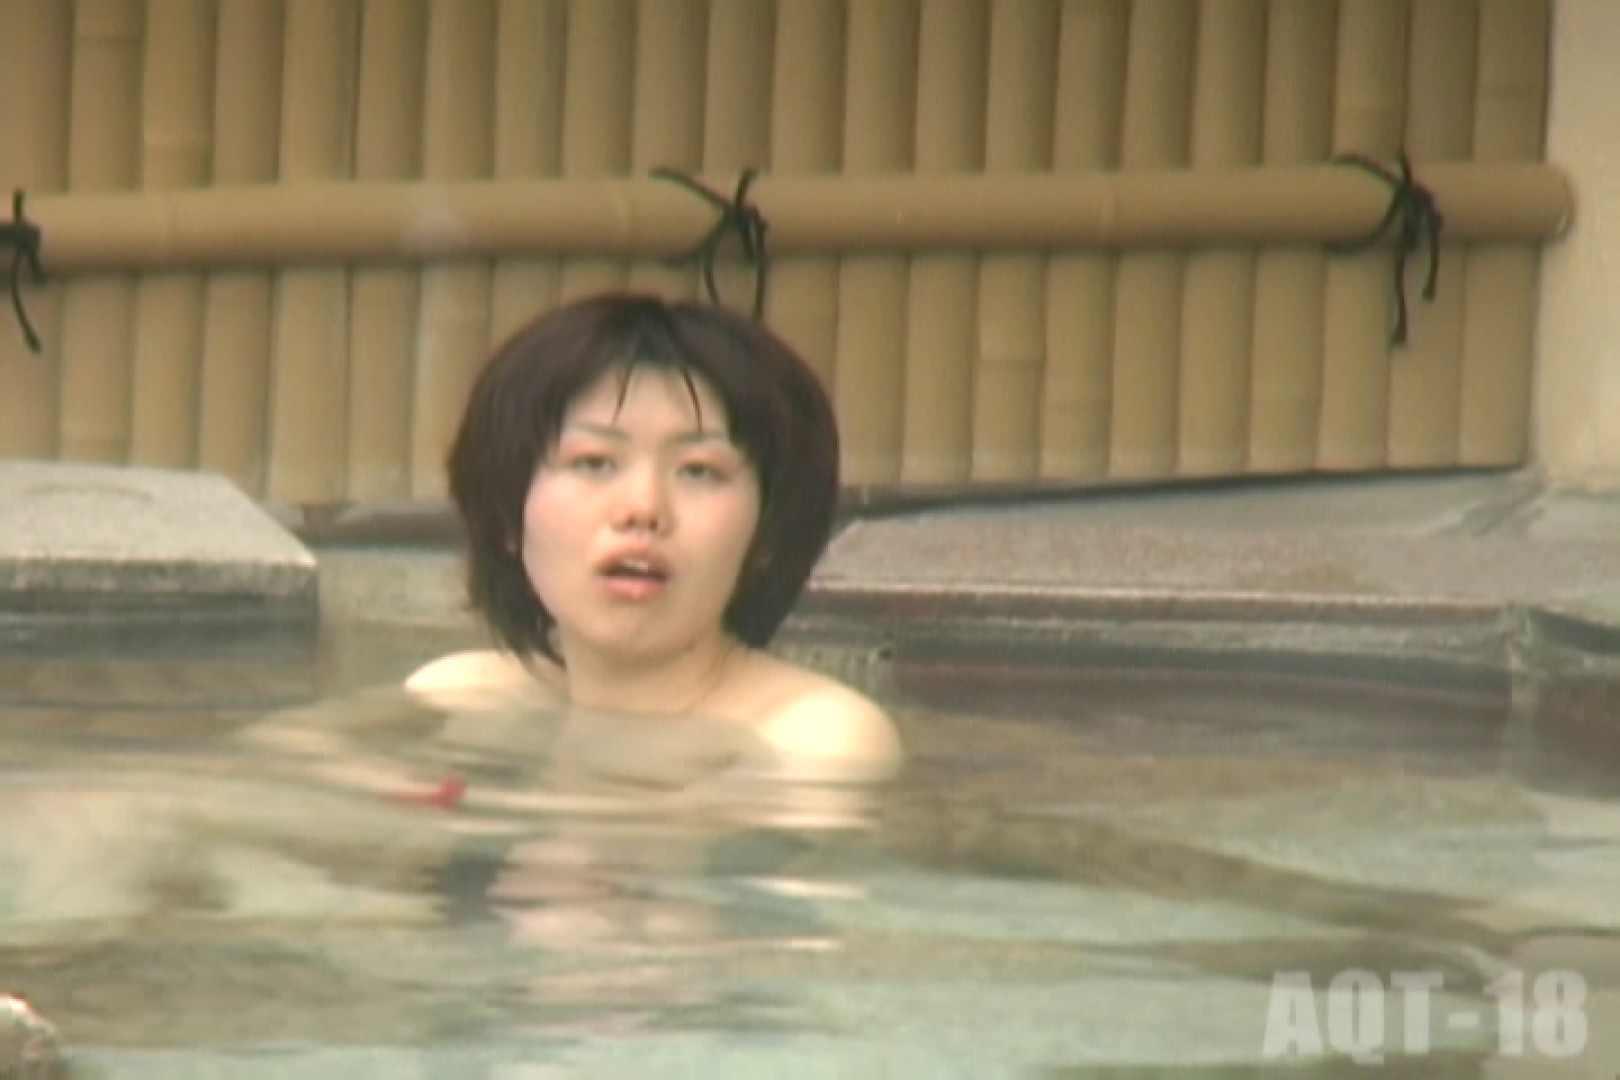 Aquaな露天風呂Vol.861 0  87連発 24